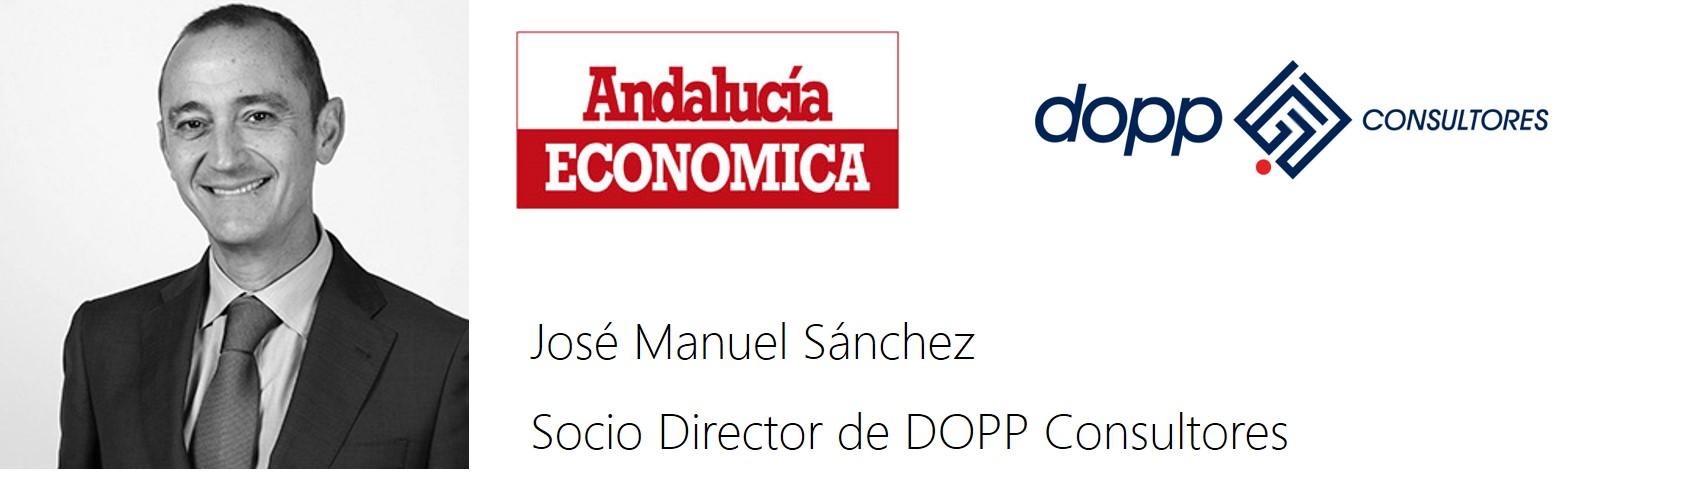 Cabecer Jose Manuel Sanchez